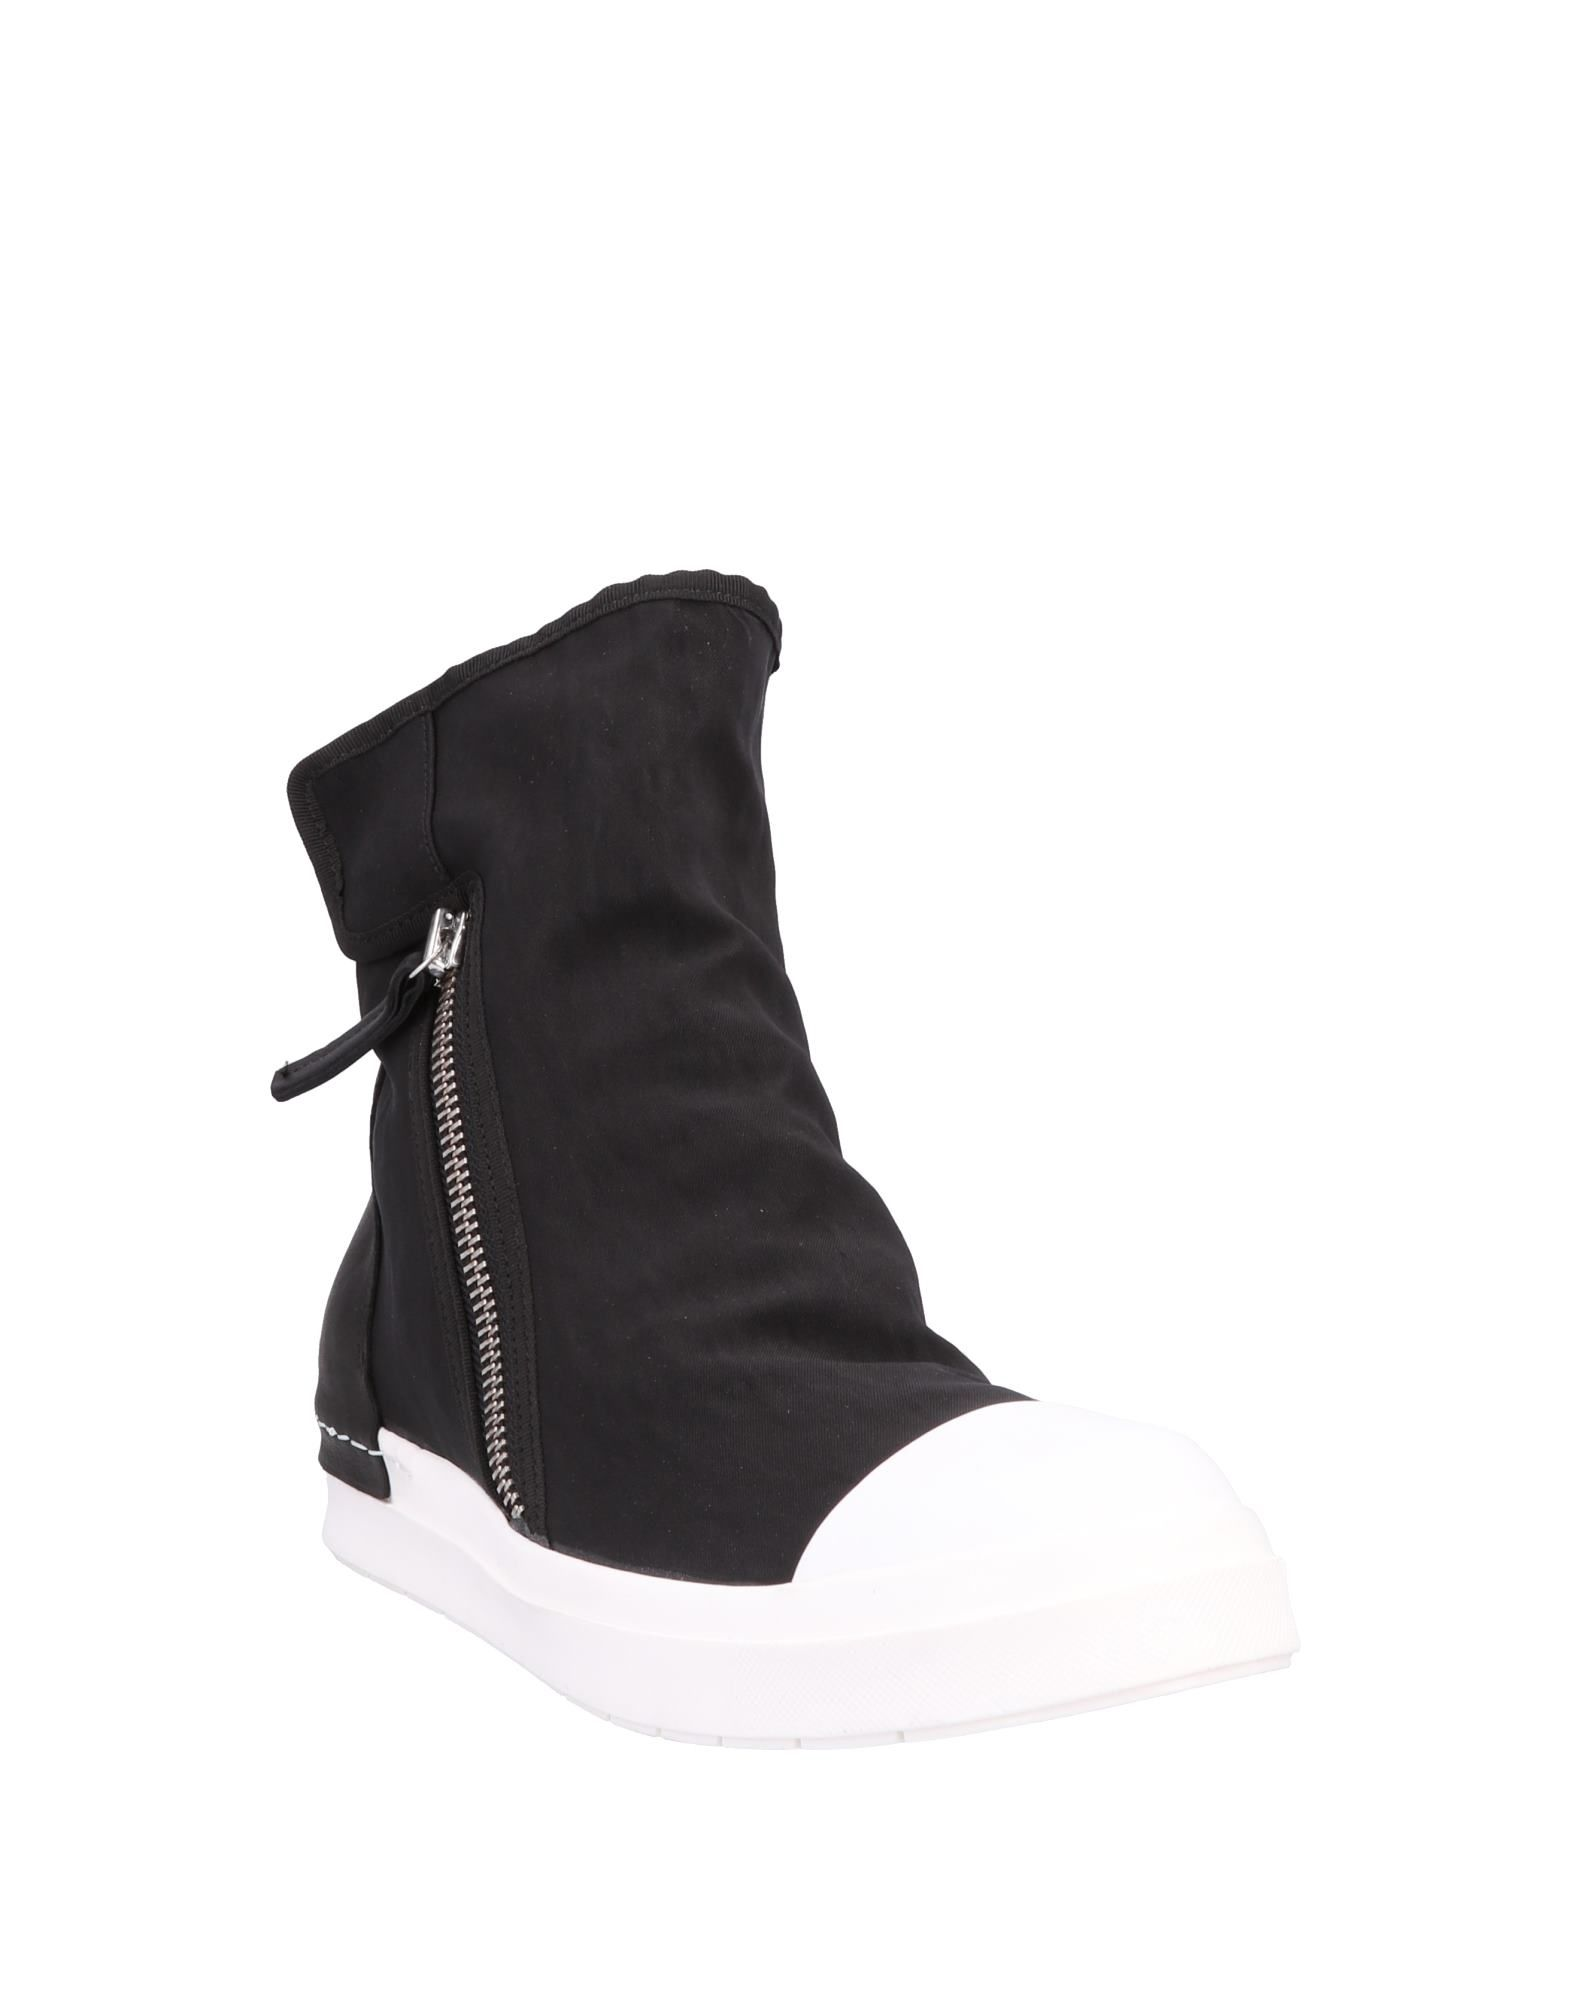 Cinzia Araia Sneakers - Men Cinzia Araia Sneakers Sneakers Sneakers online on  Australia - 11572206LL 7c7afc